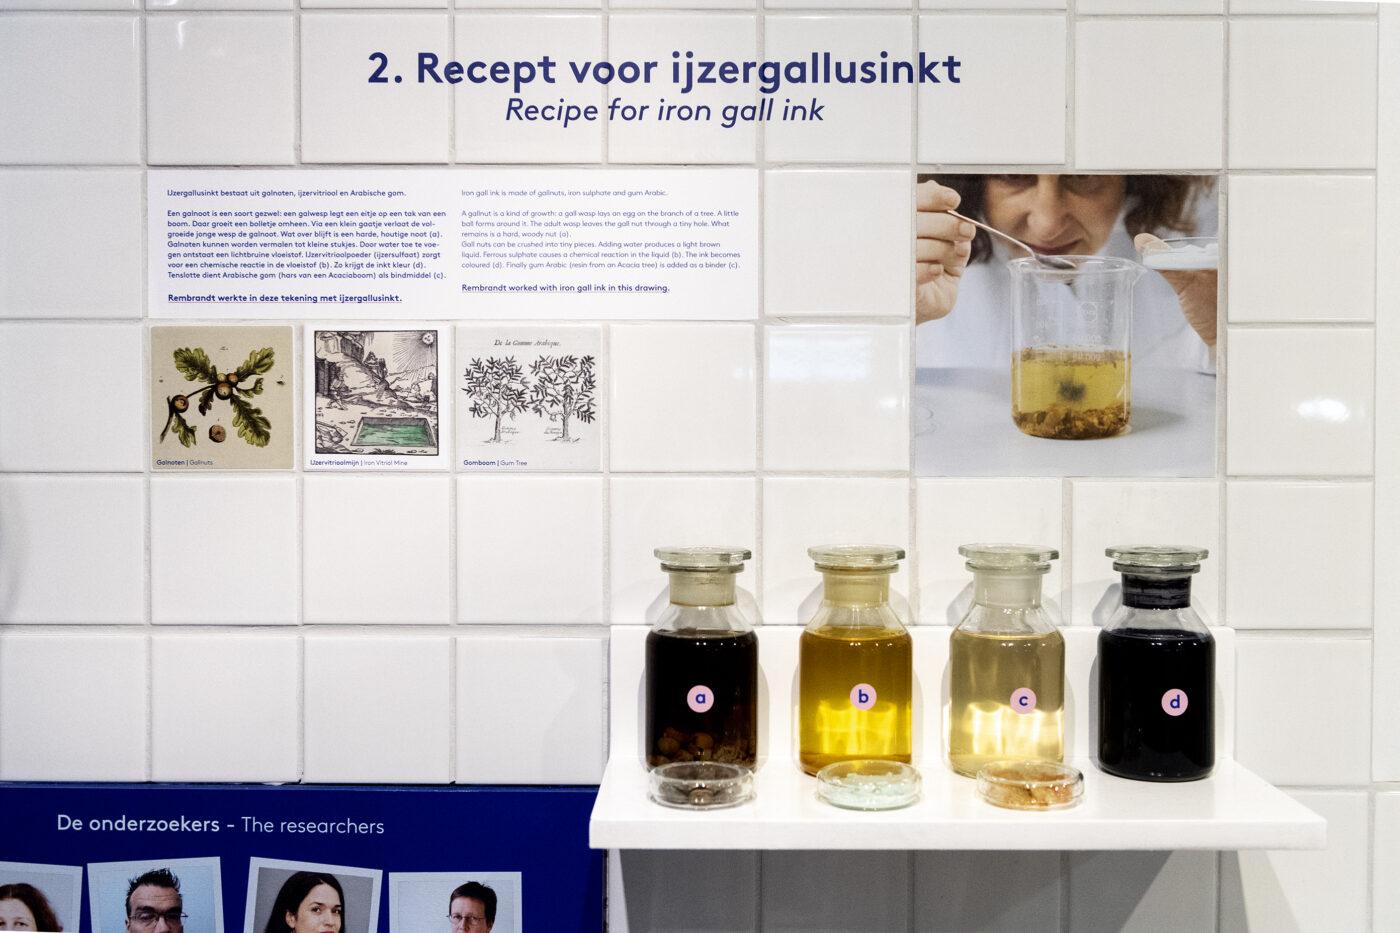 Laboratory Rembrandt